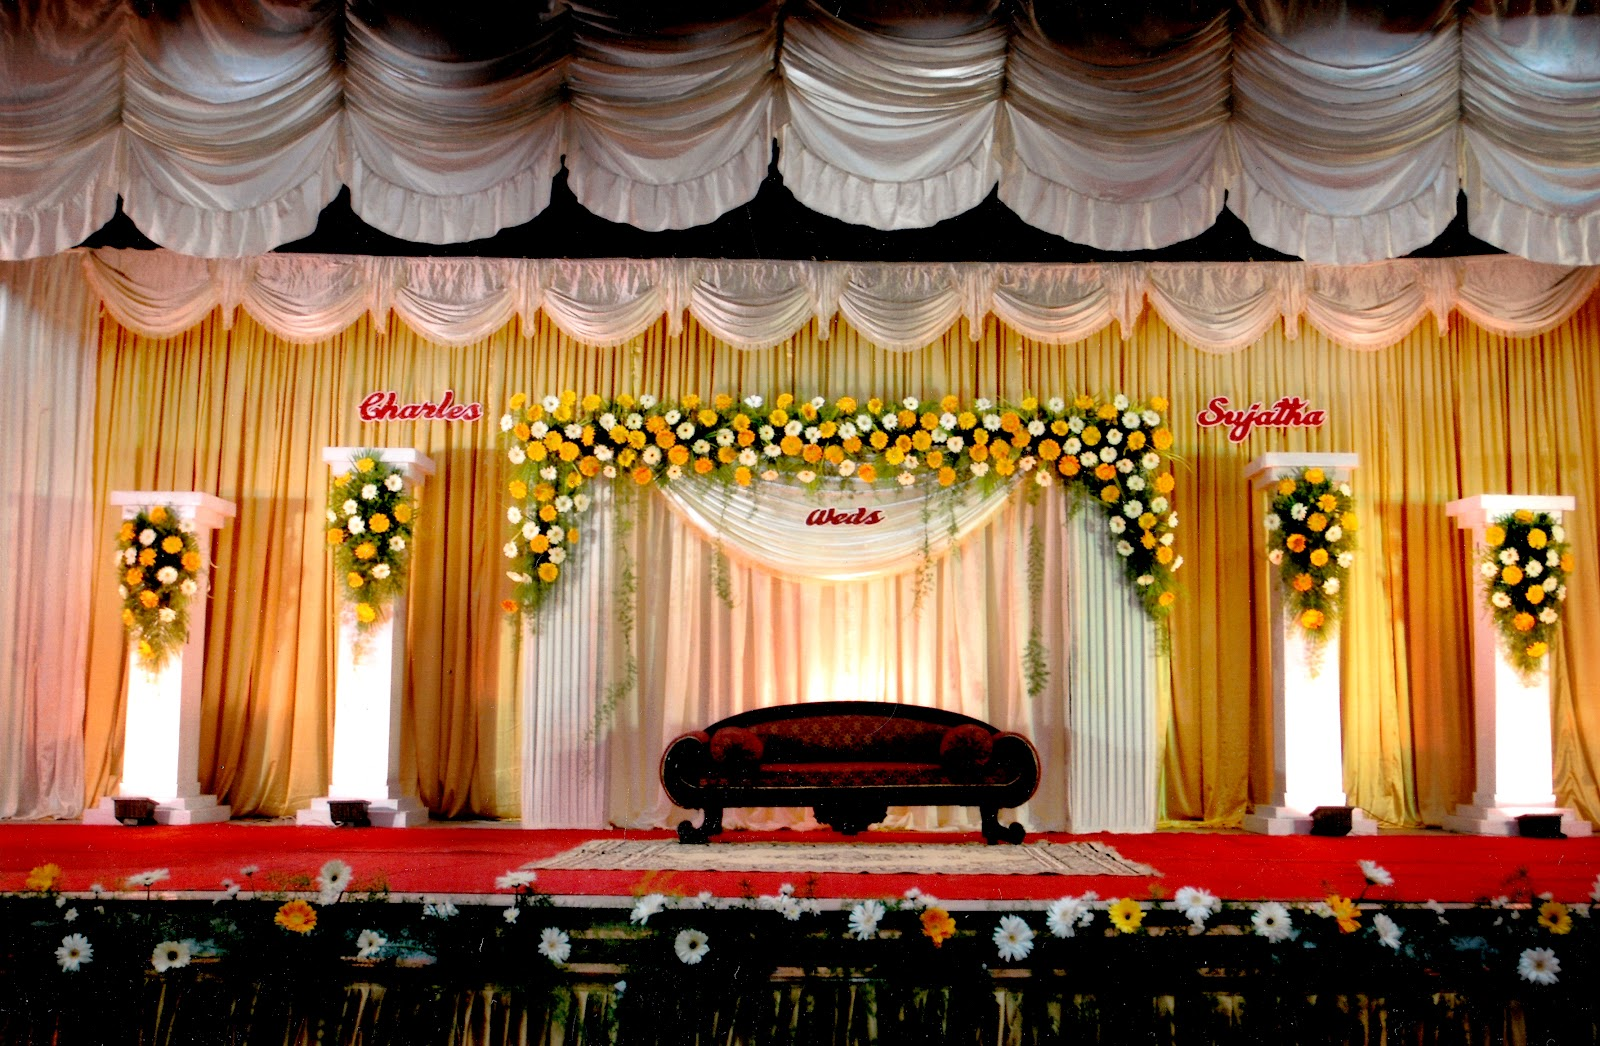 Marriage wedding stage decorations background images of india studiopk wedding stage decoration junglespirit Gallery